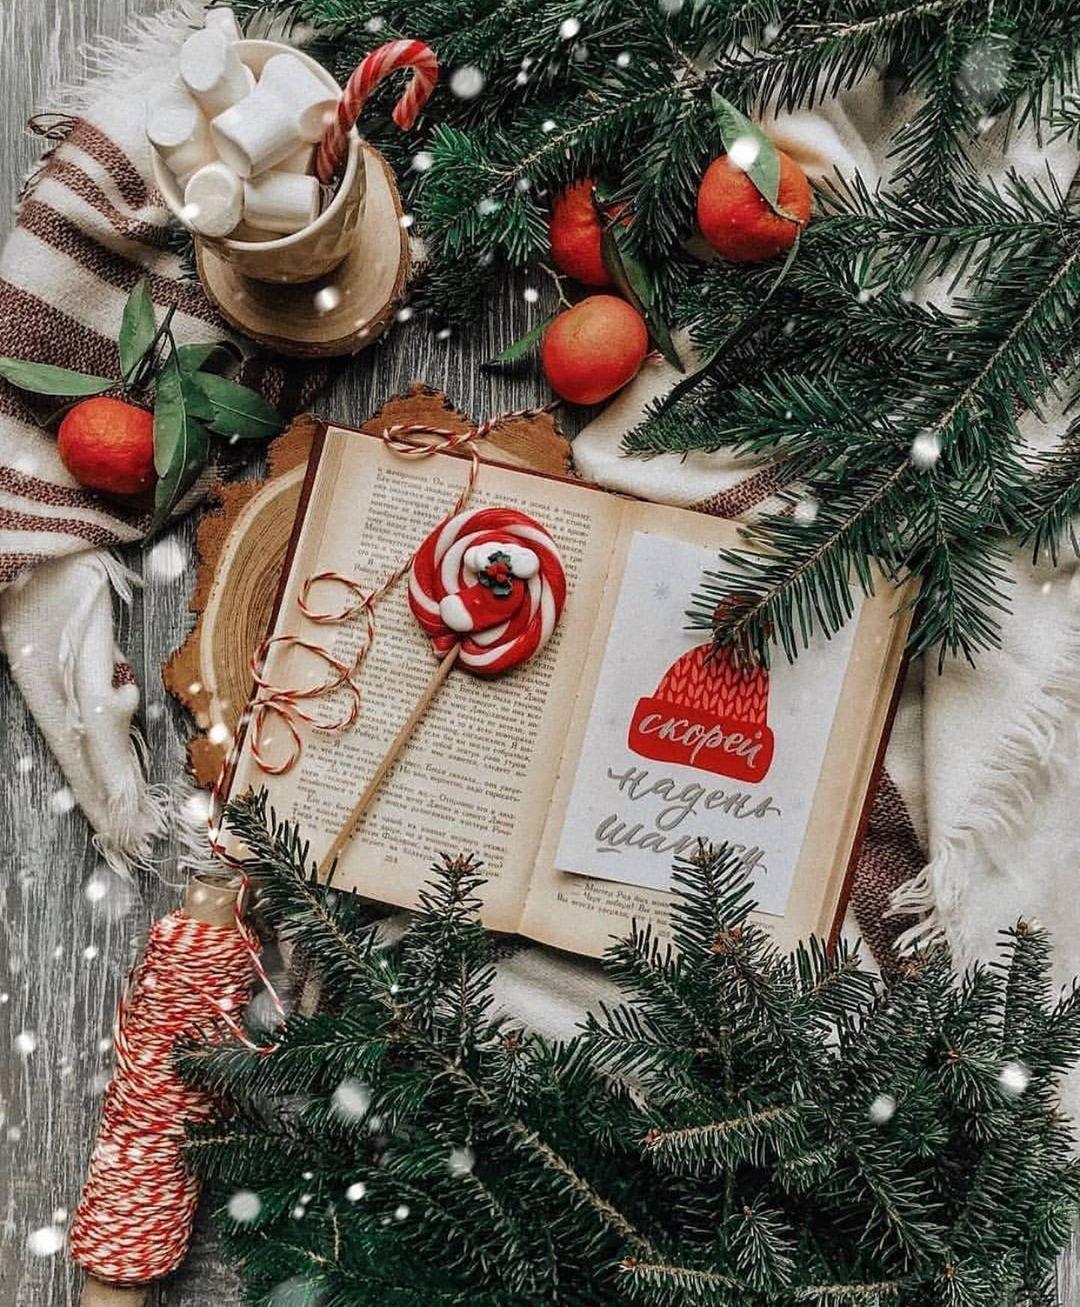 C H R I S T M A S Christmashype Fotos Y Videos De Instagram Christmas Mood Christmas Aesthetic Christmas Decorations